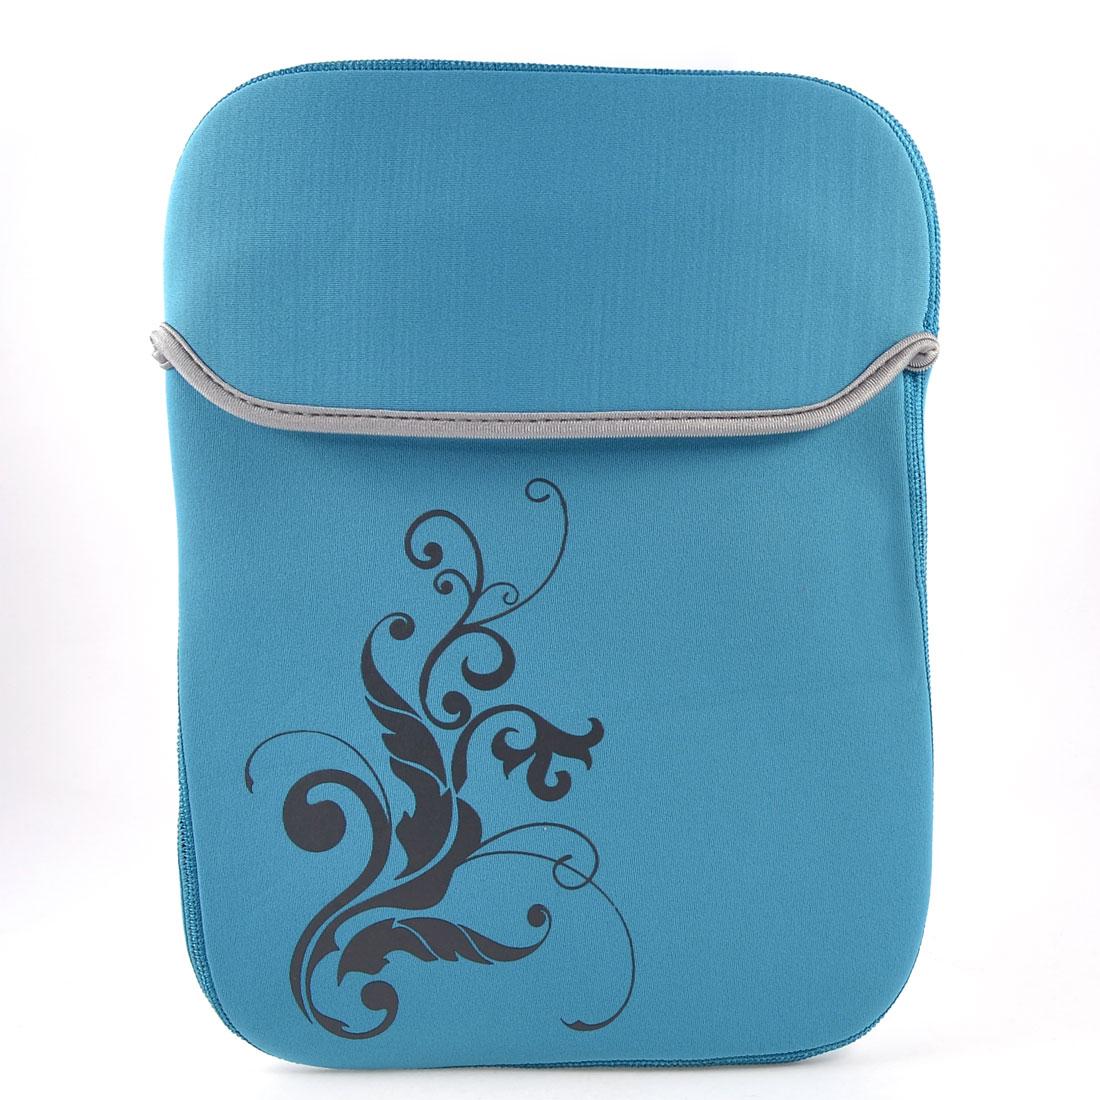 "10"" 10.1"" Tablet Laptop Flower Pattern Sky Blue Neoprene Sleeve Bag Case Pouch"